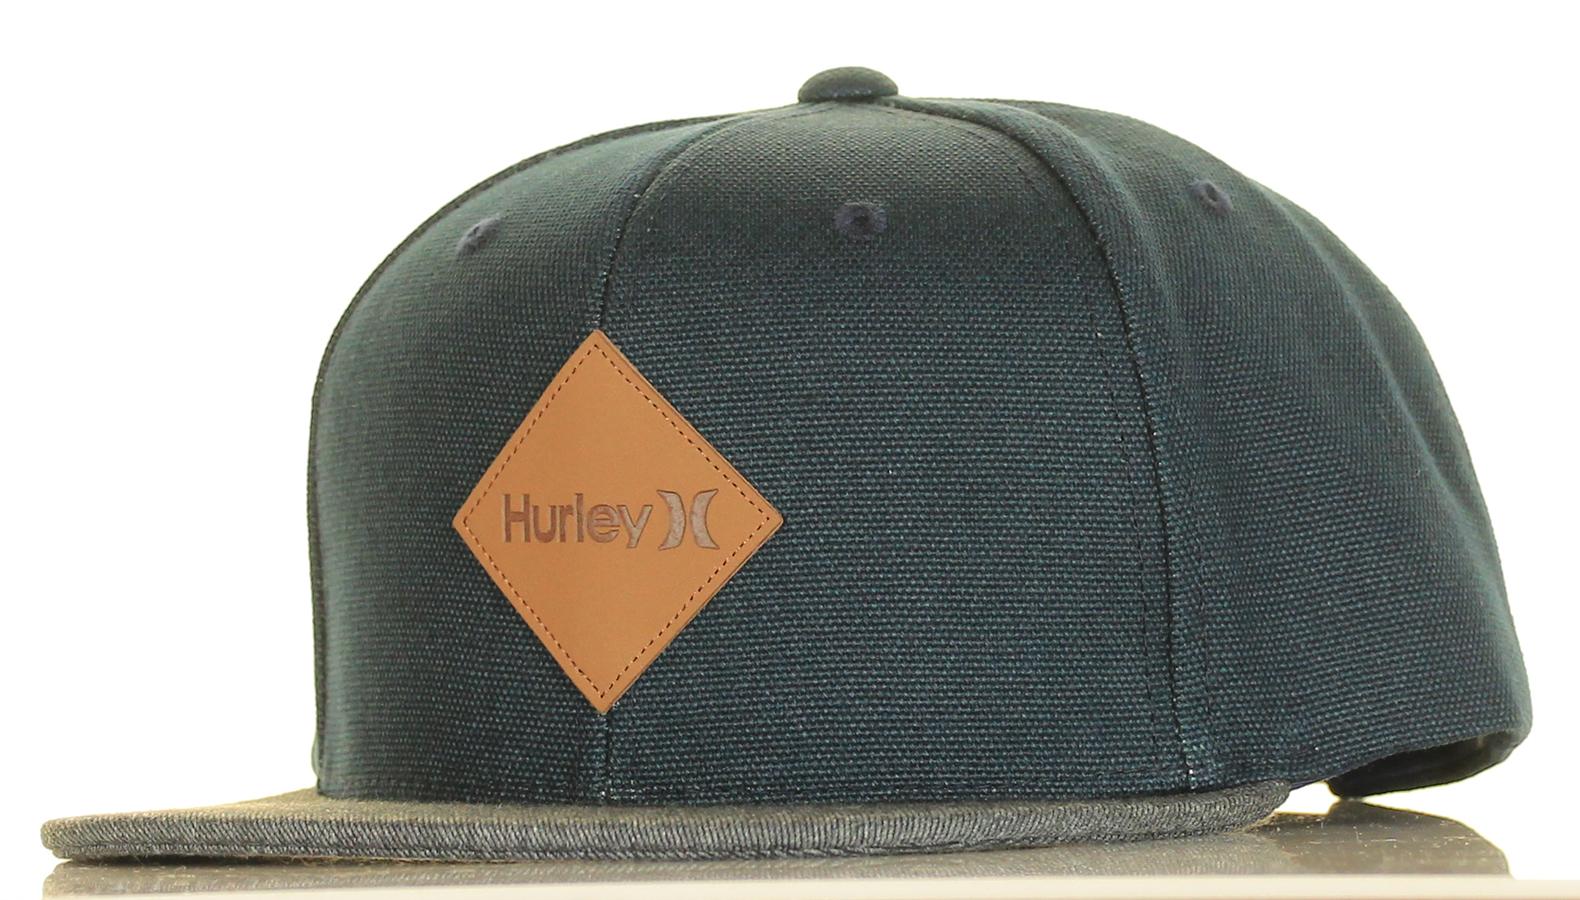 6b0b2e47e96 Inseption - Mens - Hurley - Macro Snapback Hat - Denim